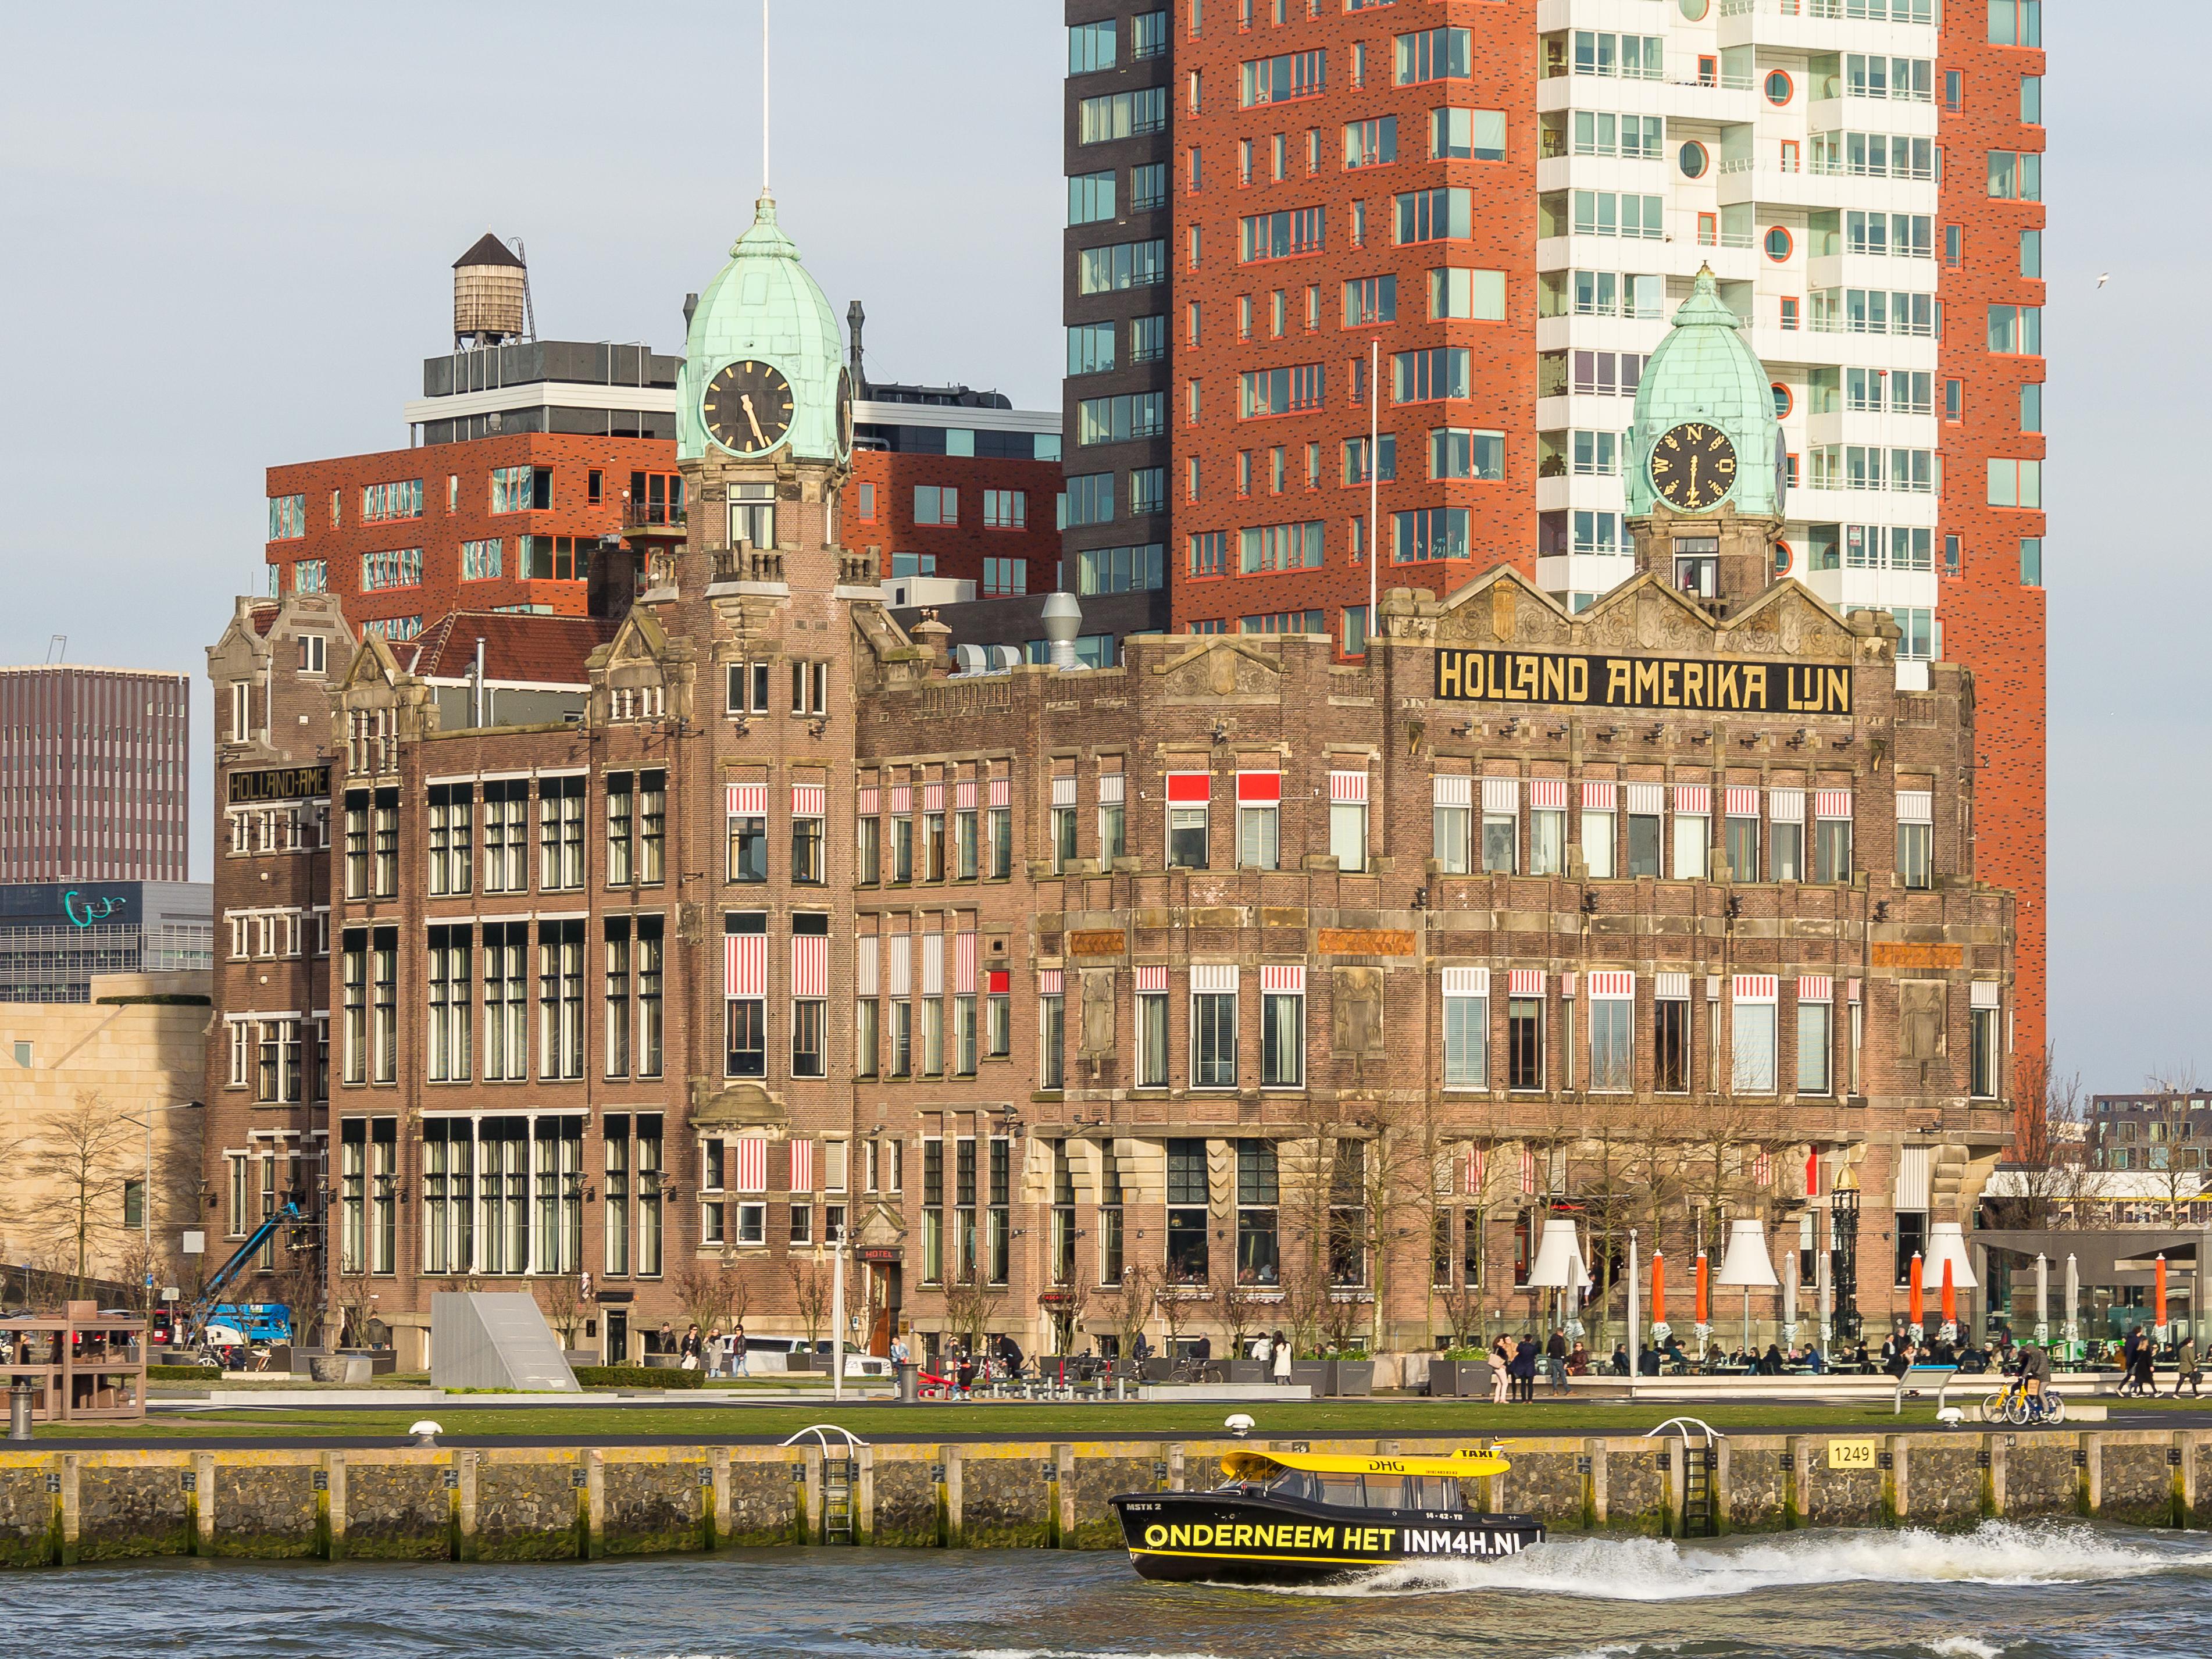 datei hotel new york rotterdam ex headquarter of holland america line wikipedia. Black Bedroom Furniture Sets. Home Design Ideas